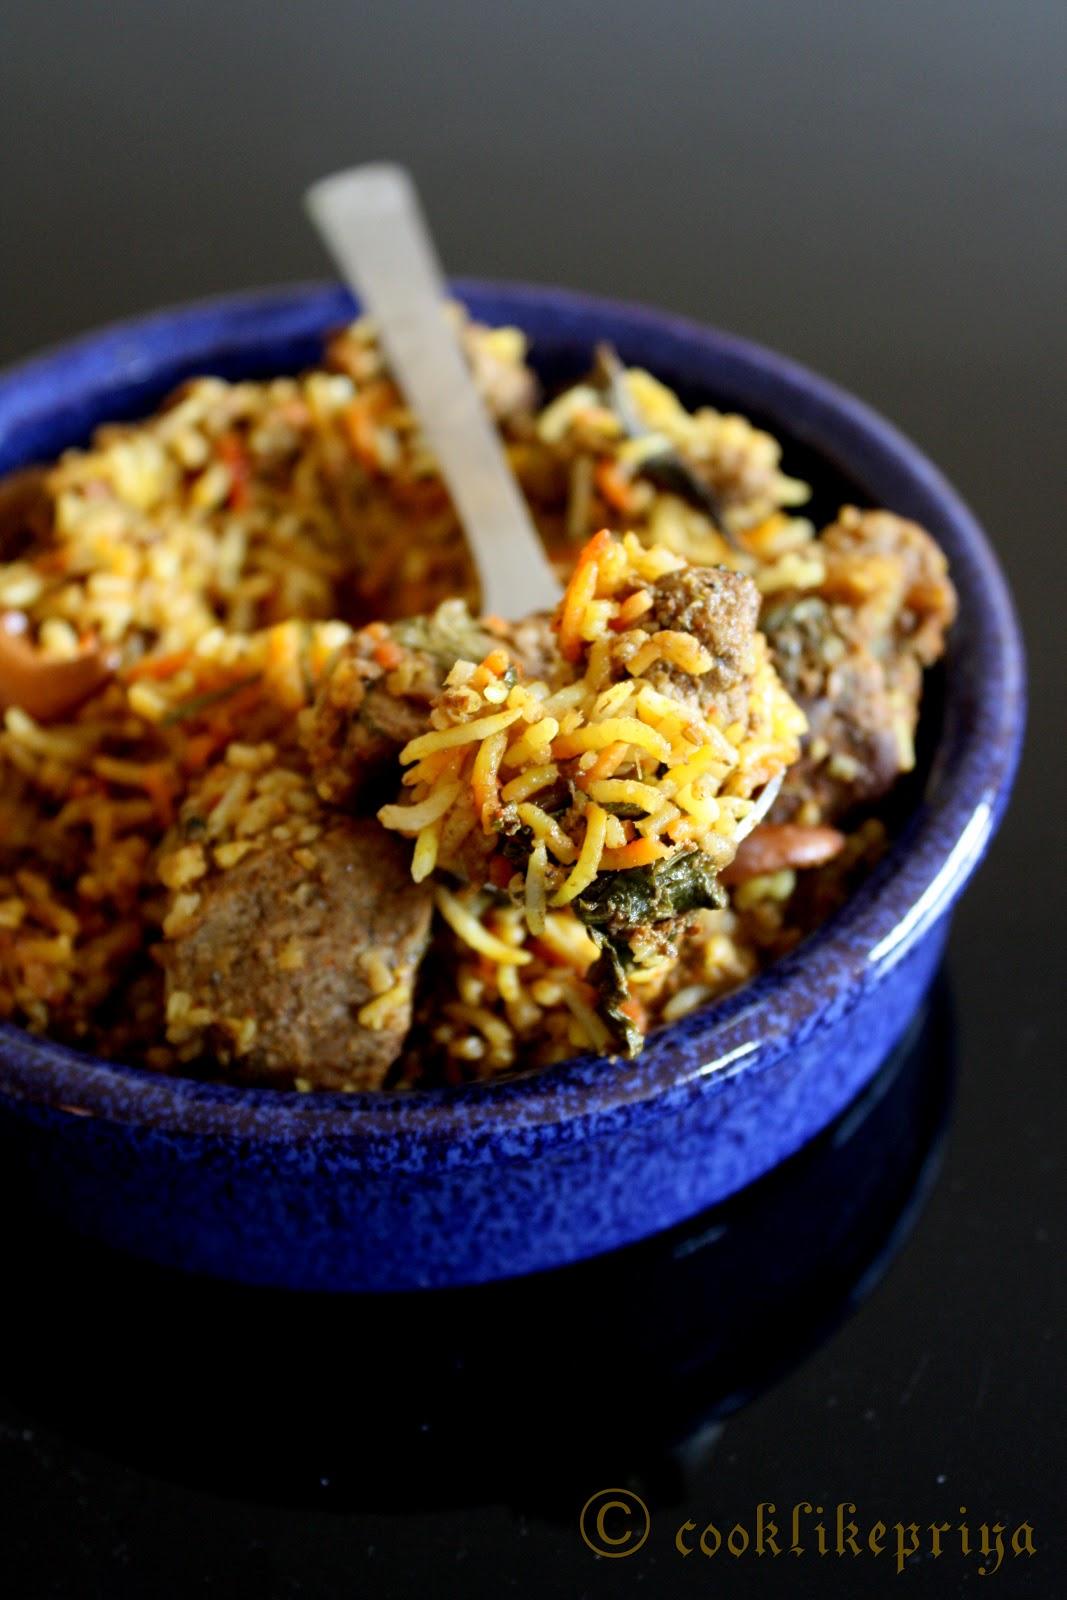 Cook like priya hyderabadi mutton biryani kachi biryani hyderabadi mutton biryani kachi biryani restaurant style mutton dum biryani forumfinder Images